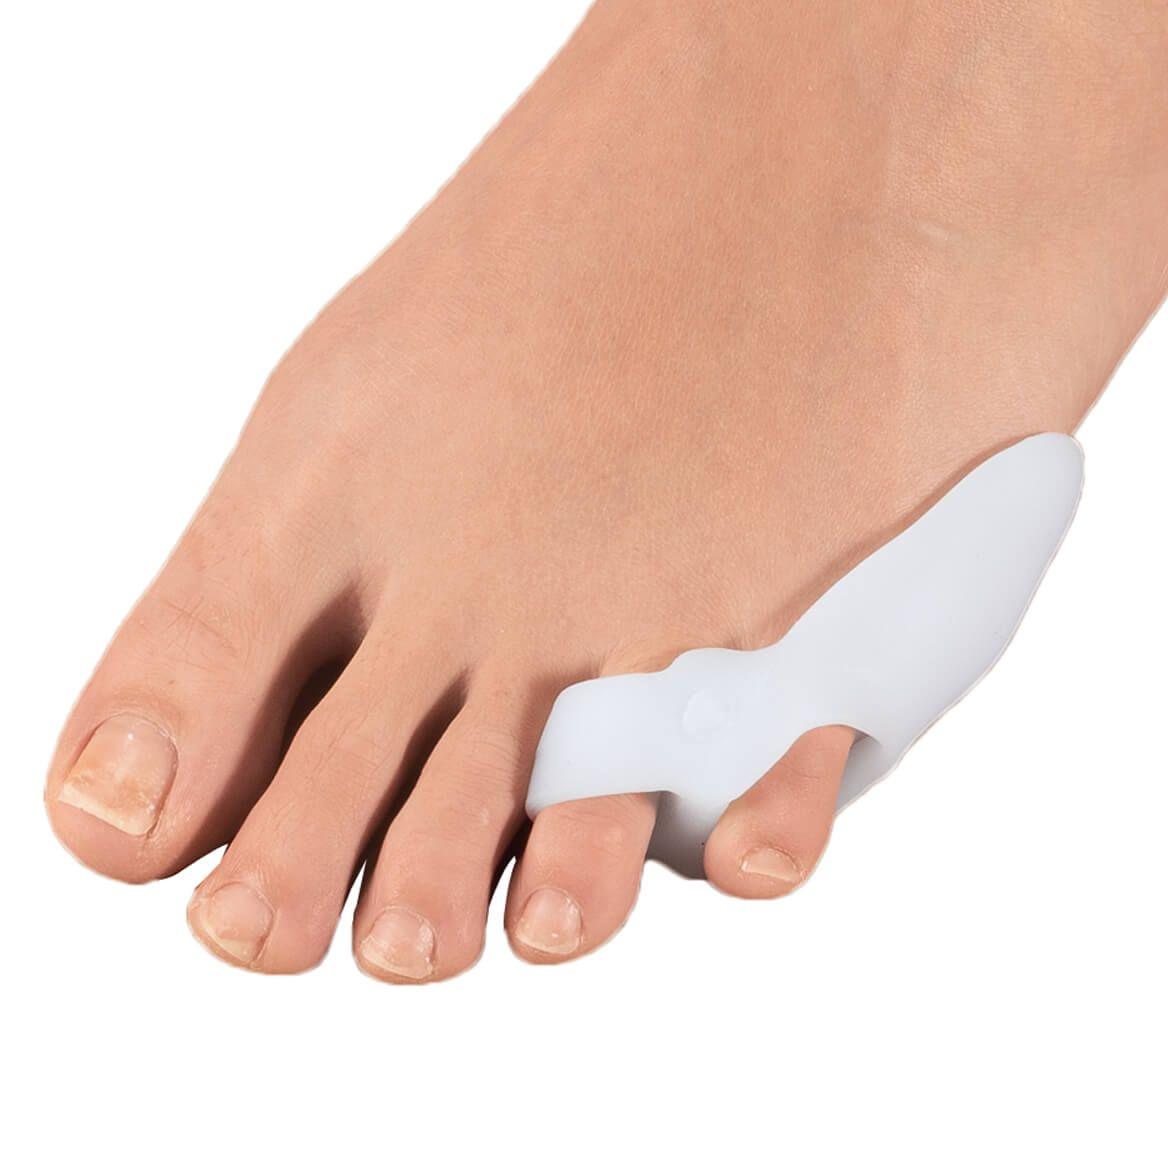 Silver Steps™ Tailor Gel Bunion Toe Spreader, S/2-359684